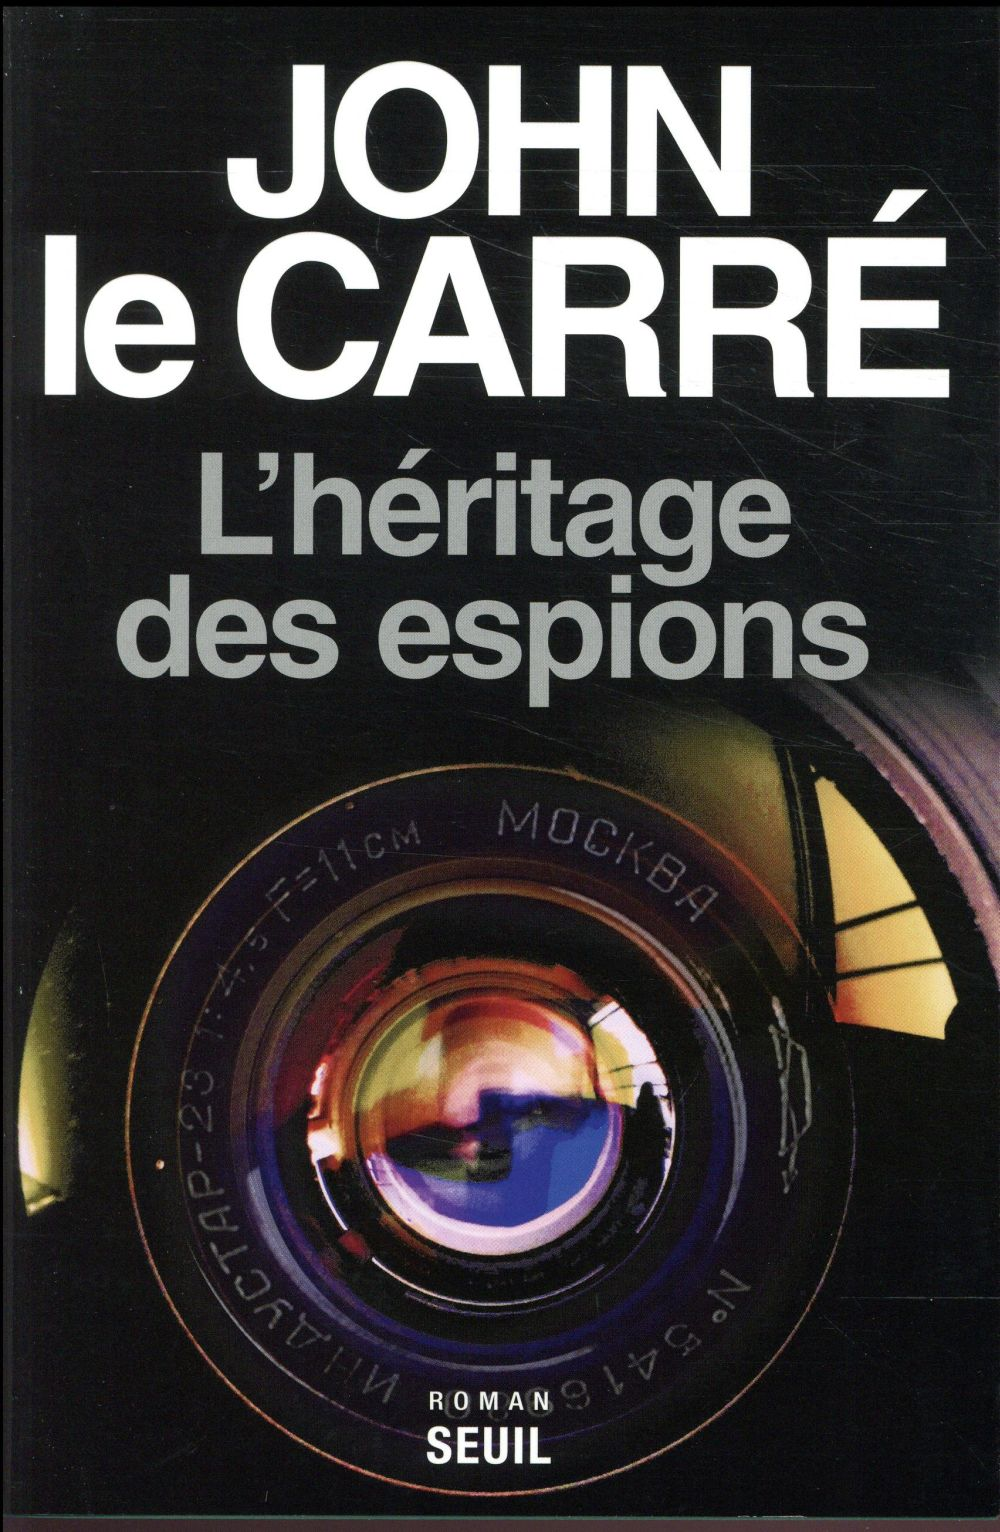 L'HERITAGE DES ESPIONS LE CARRE JOHN SEUIL